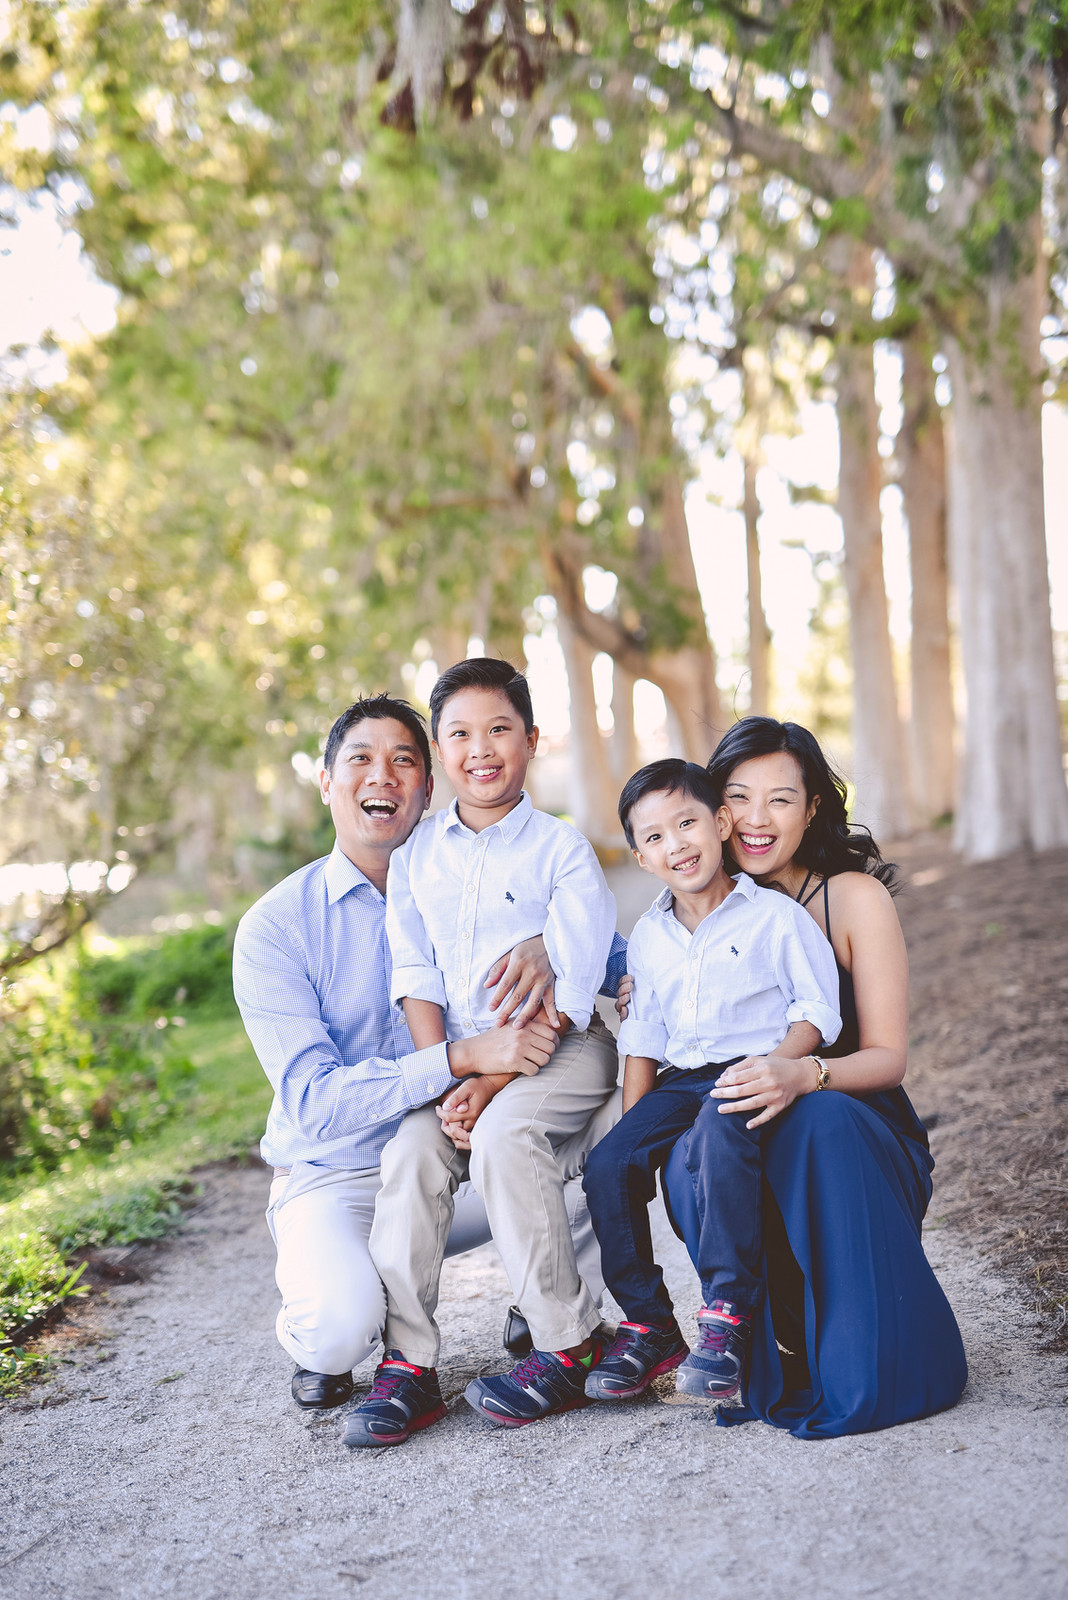 Orlando Family Photographer | Pat Wong Photography